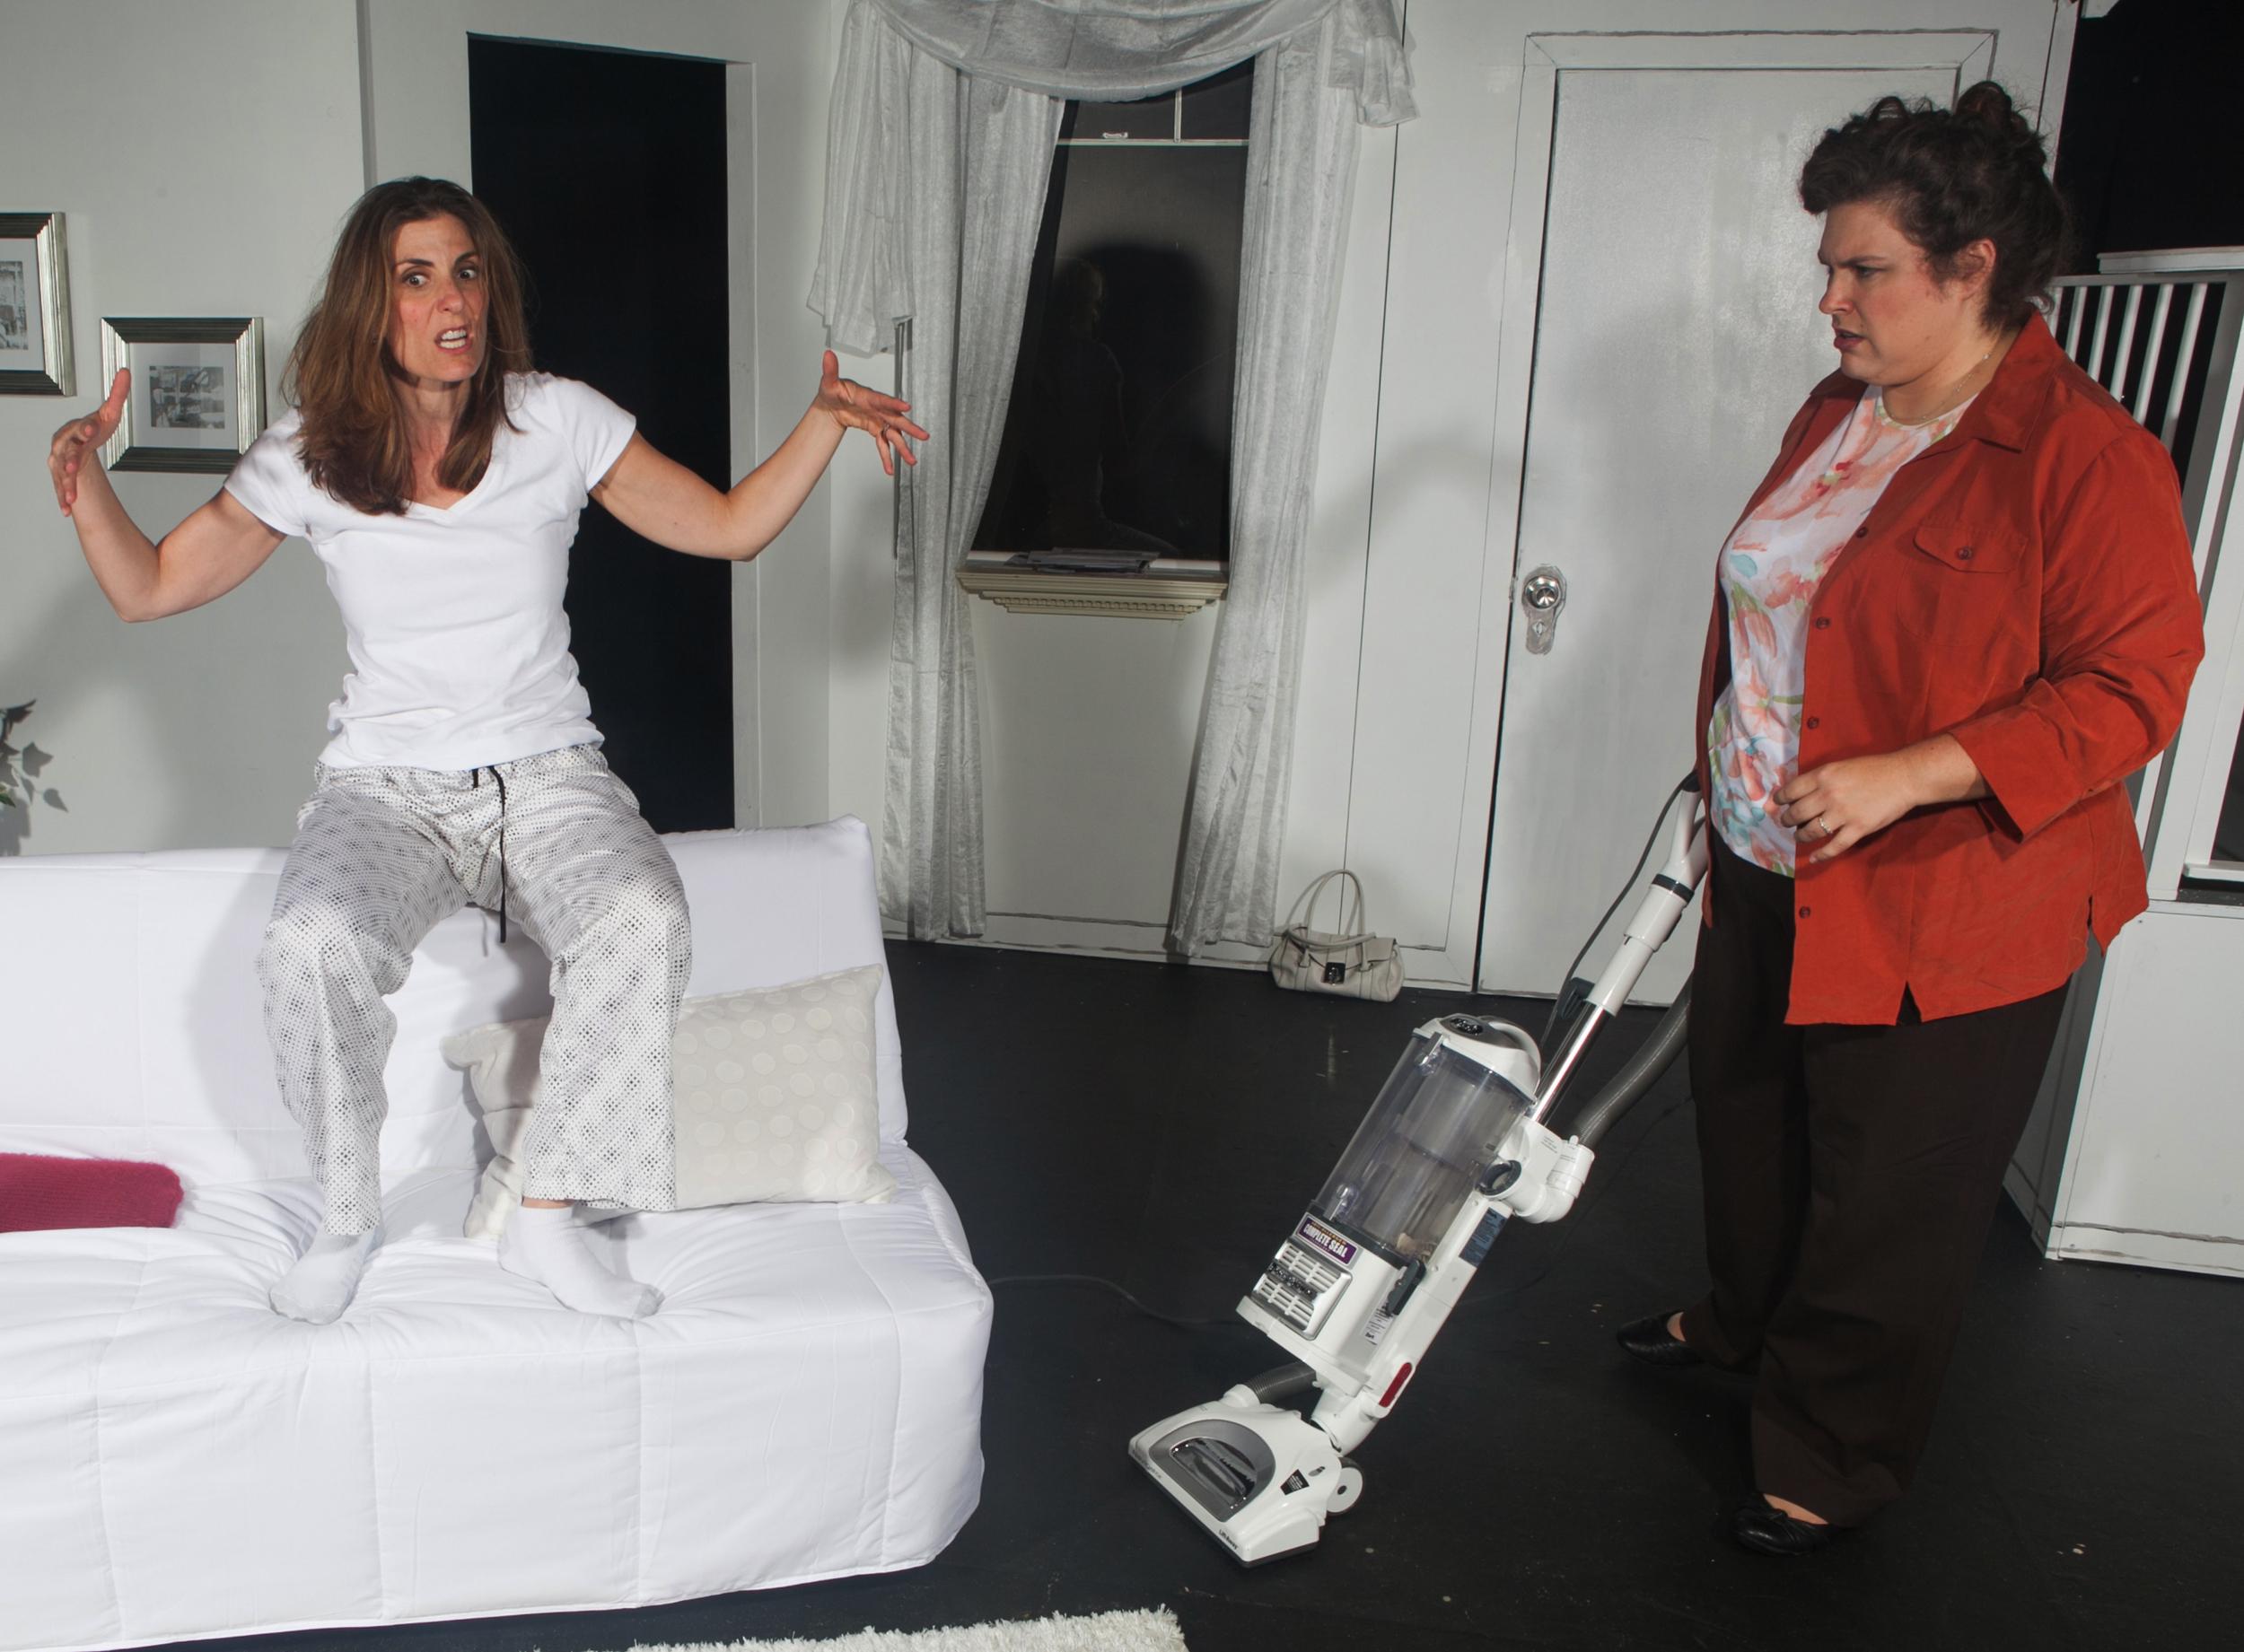 Susan Steinmeyer (Lane) and Deborah Hearst (Virginia)